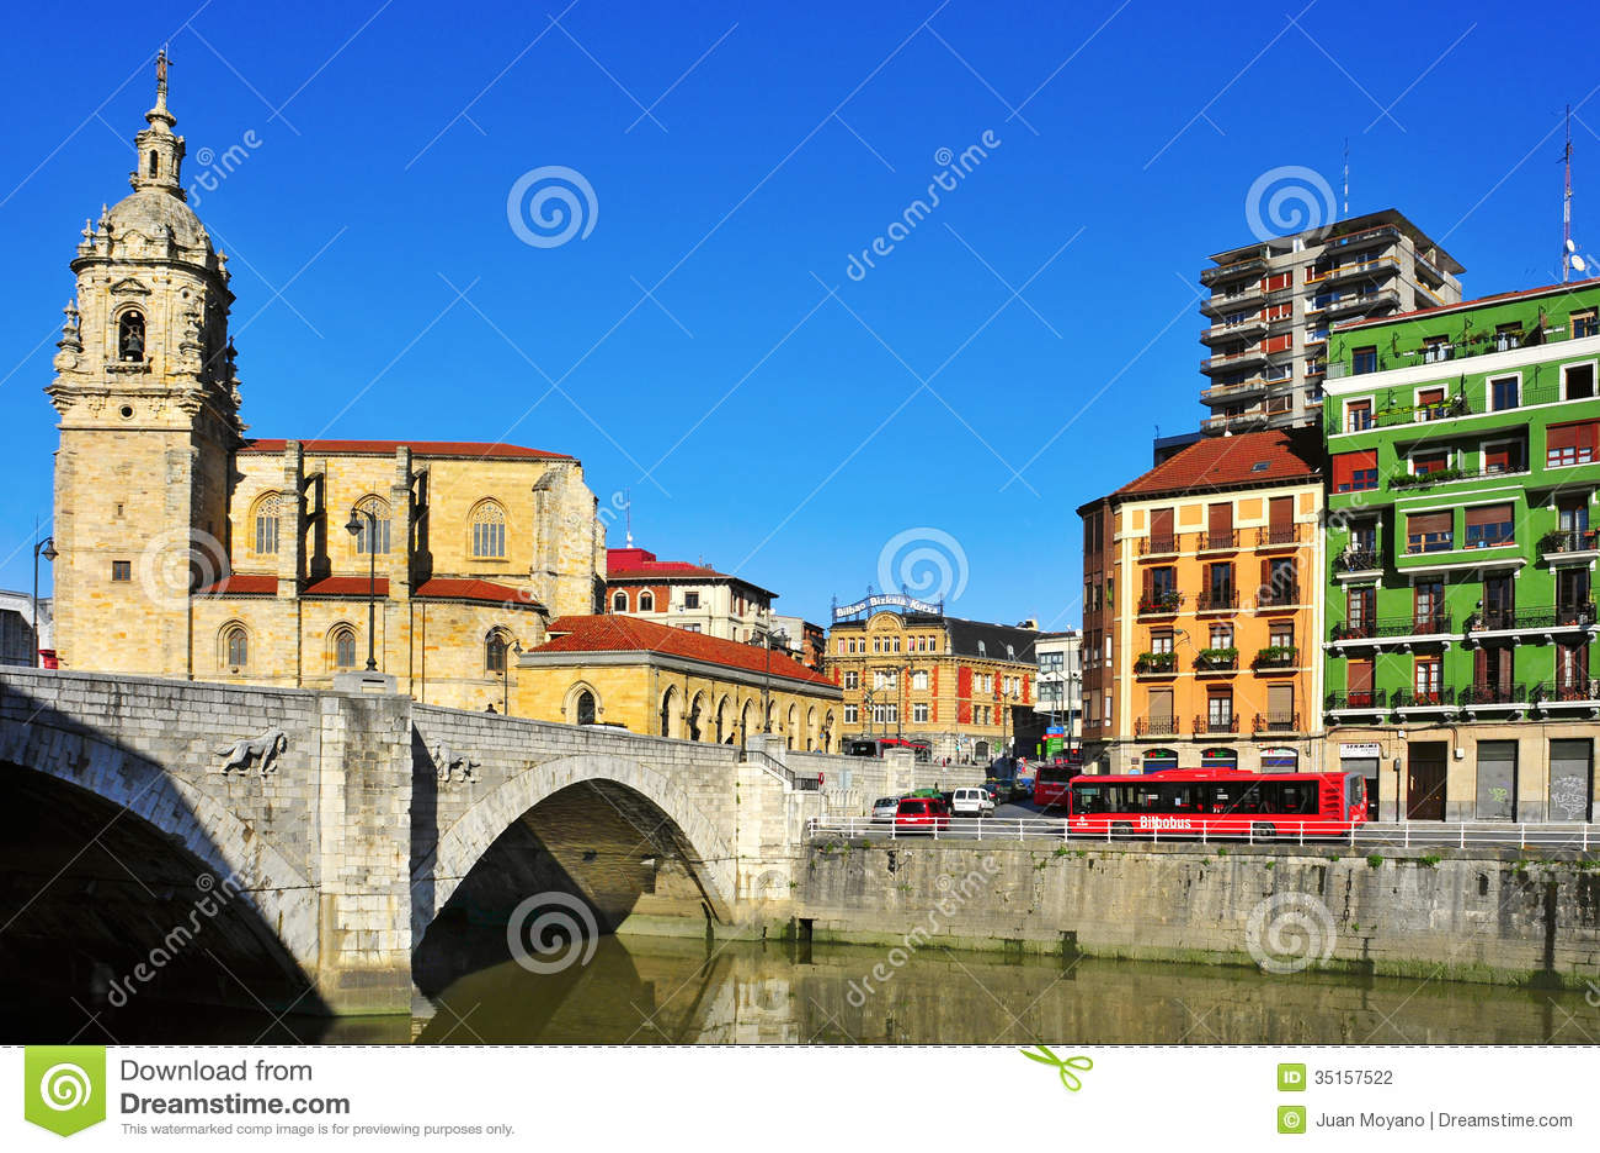 Bilbao spain november 13 san anton bridge and san anton church on